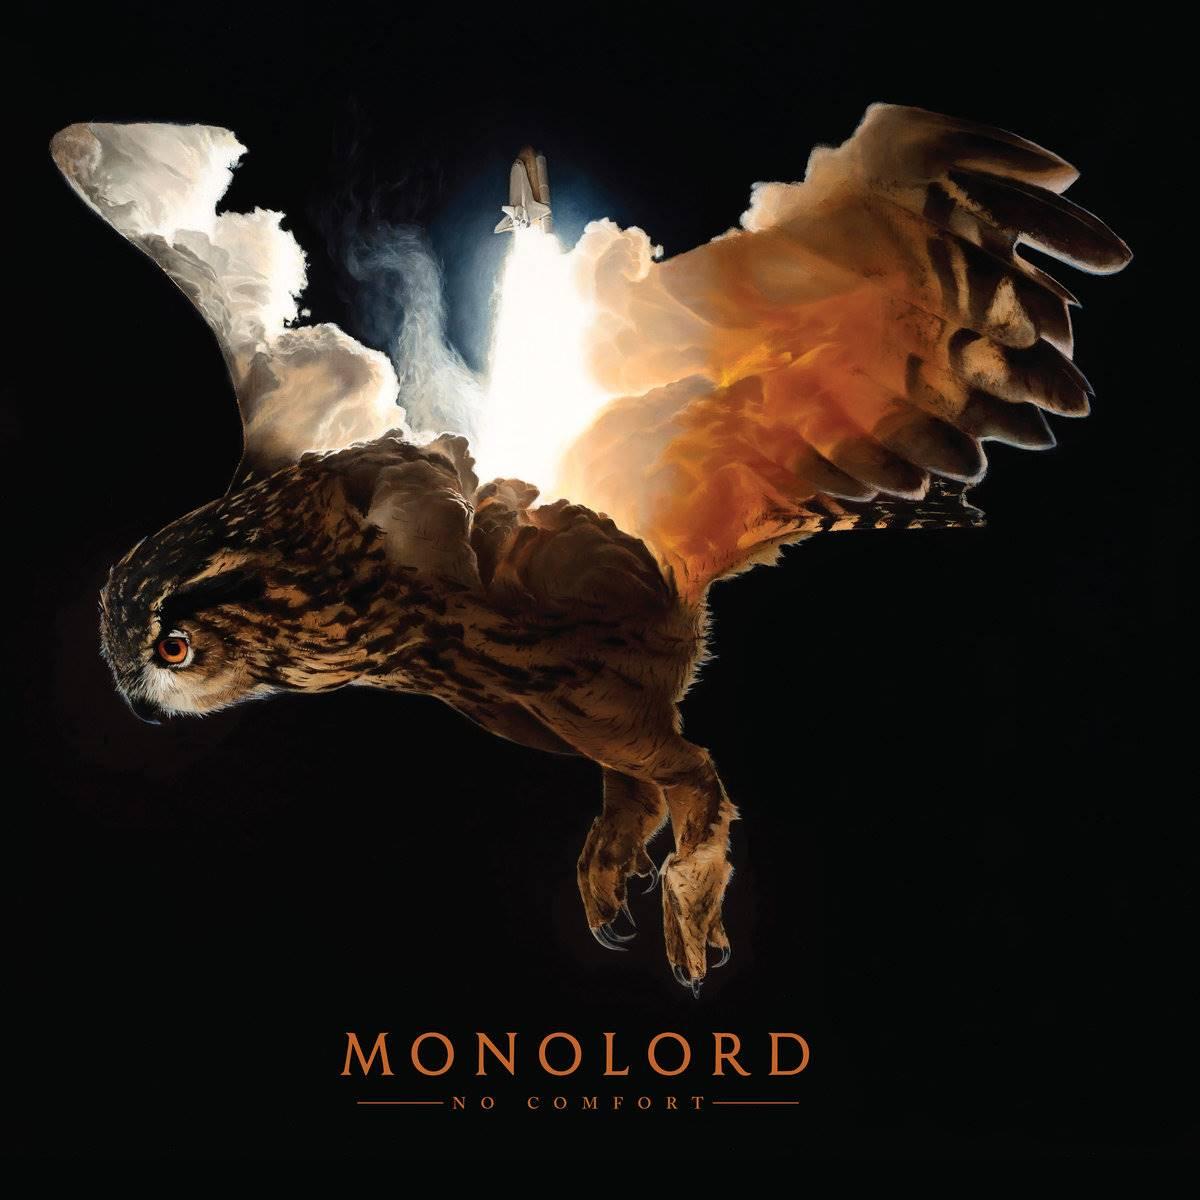 Музыка которая меня впечатлила: Monolord